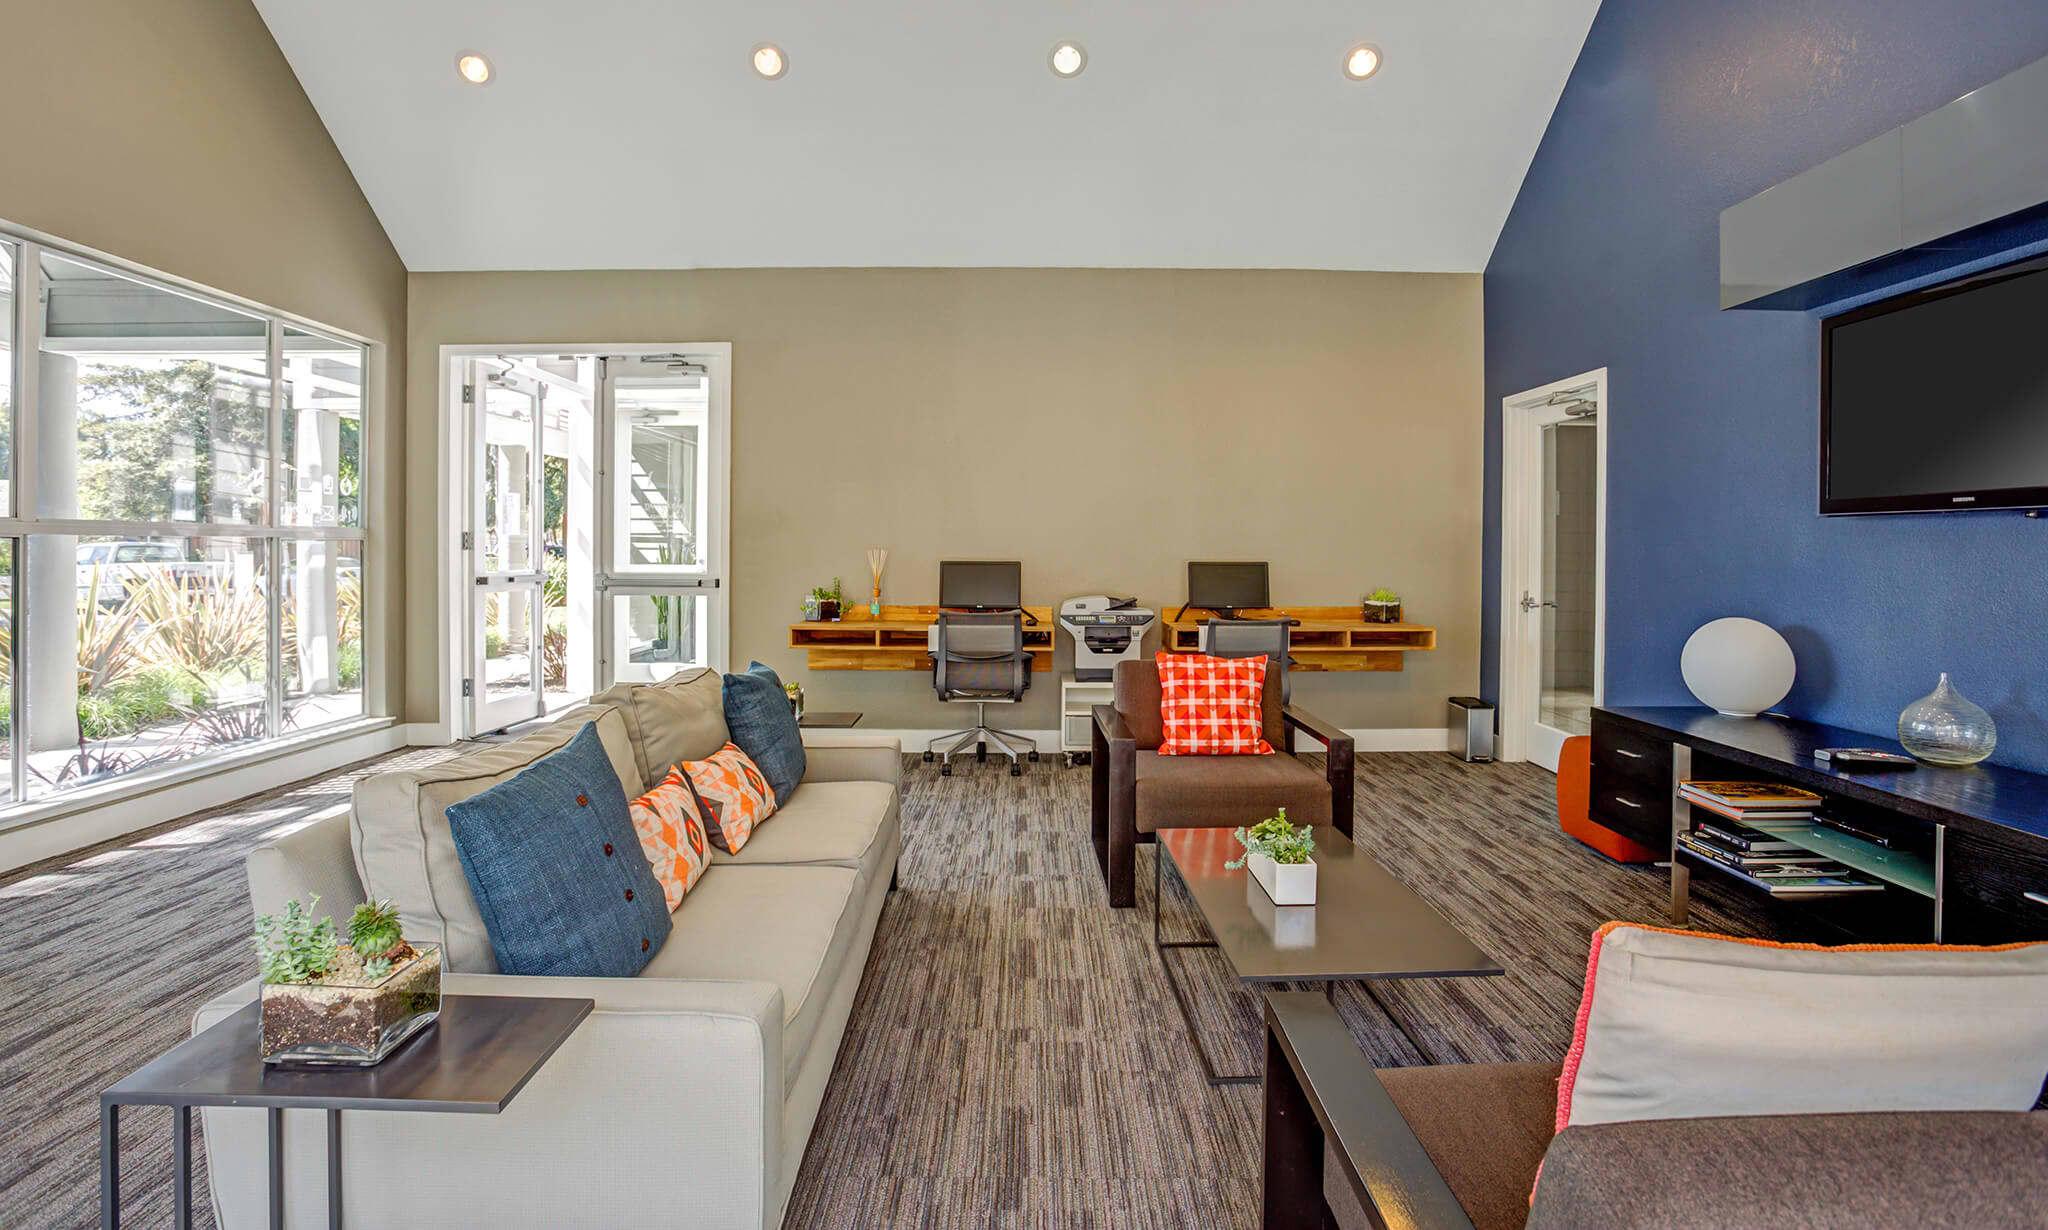 Timberleaf Apartments apartments in Santa Clara CA to rent photo 3